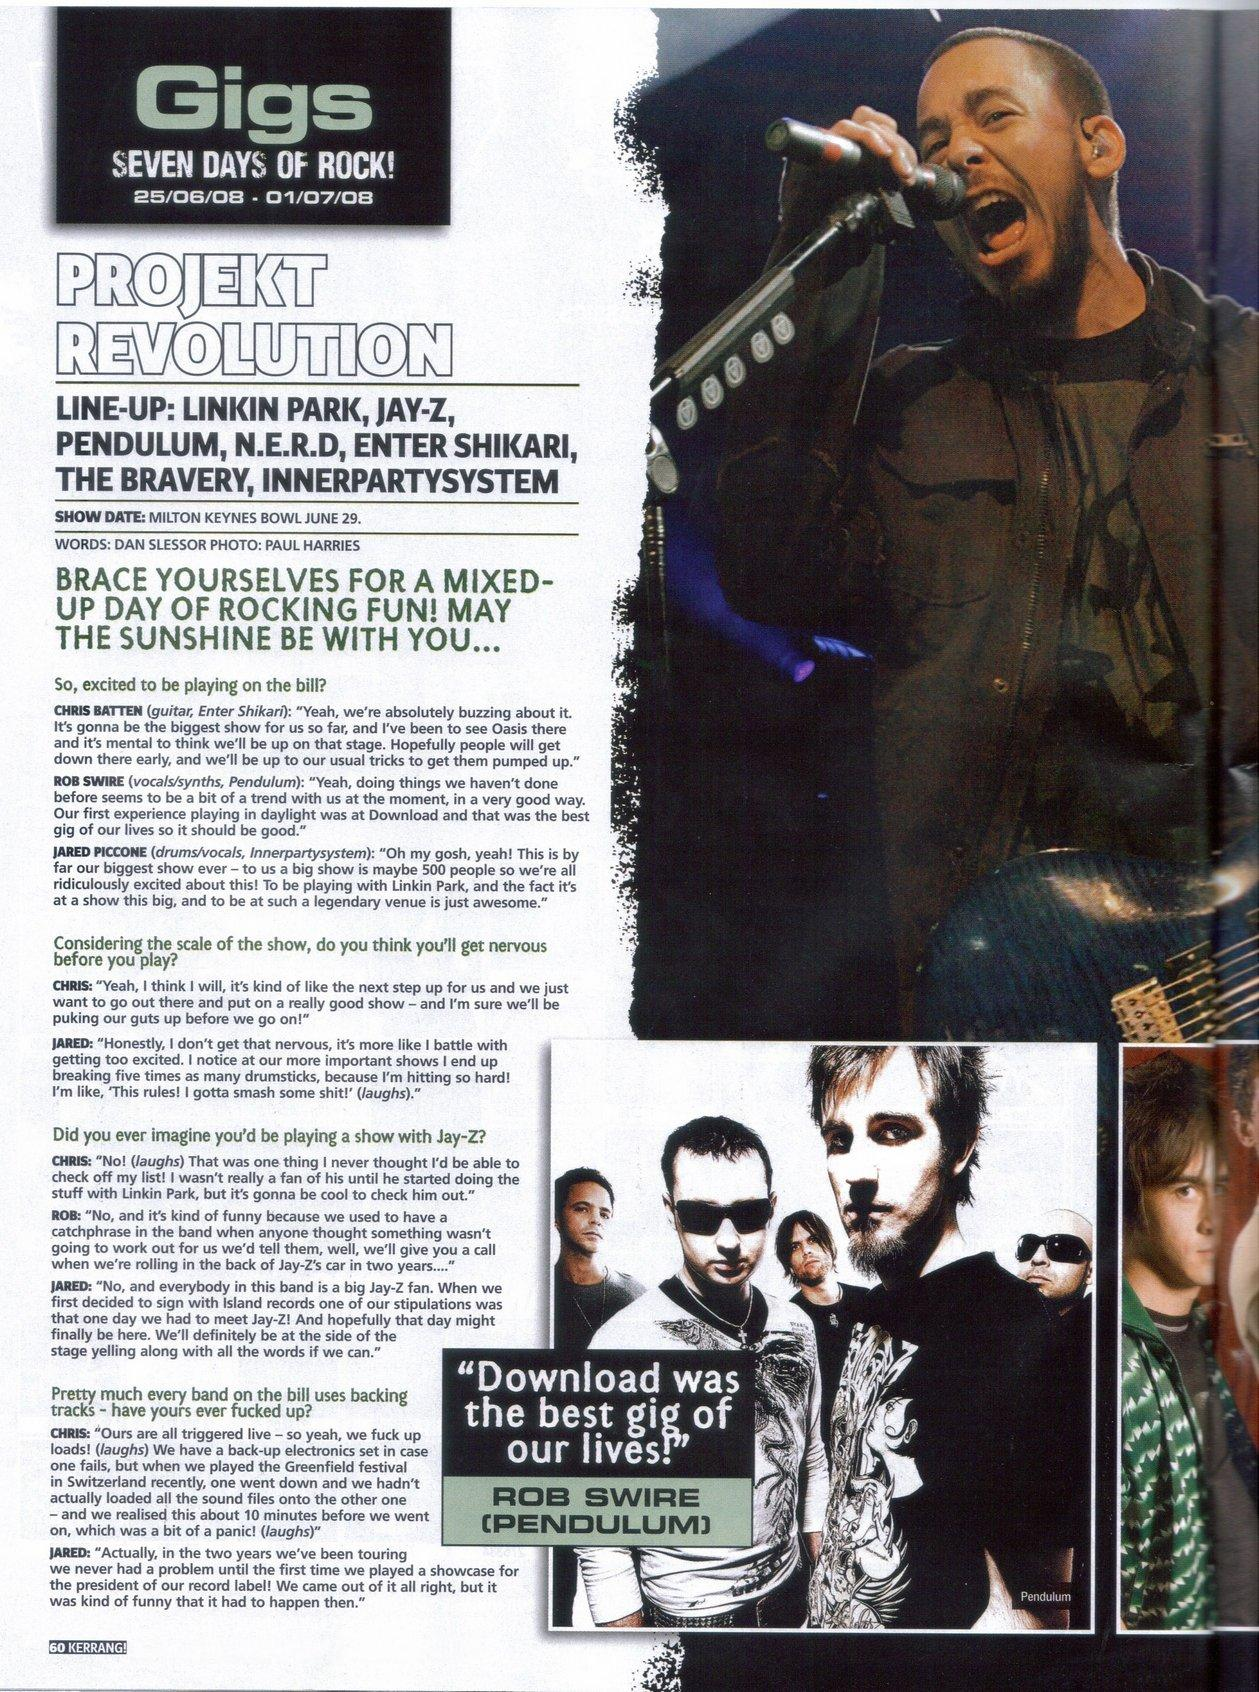 http://s2.picofile.com/file/7569035585/Kerrang2008_lpfan_blogsky_com_1_.jpg